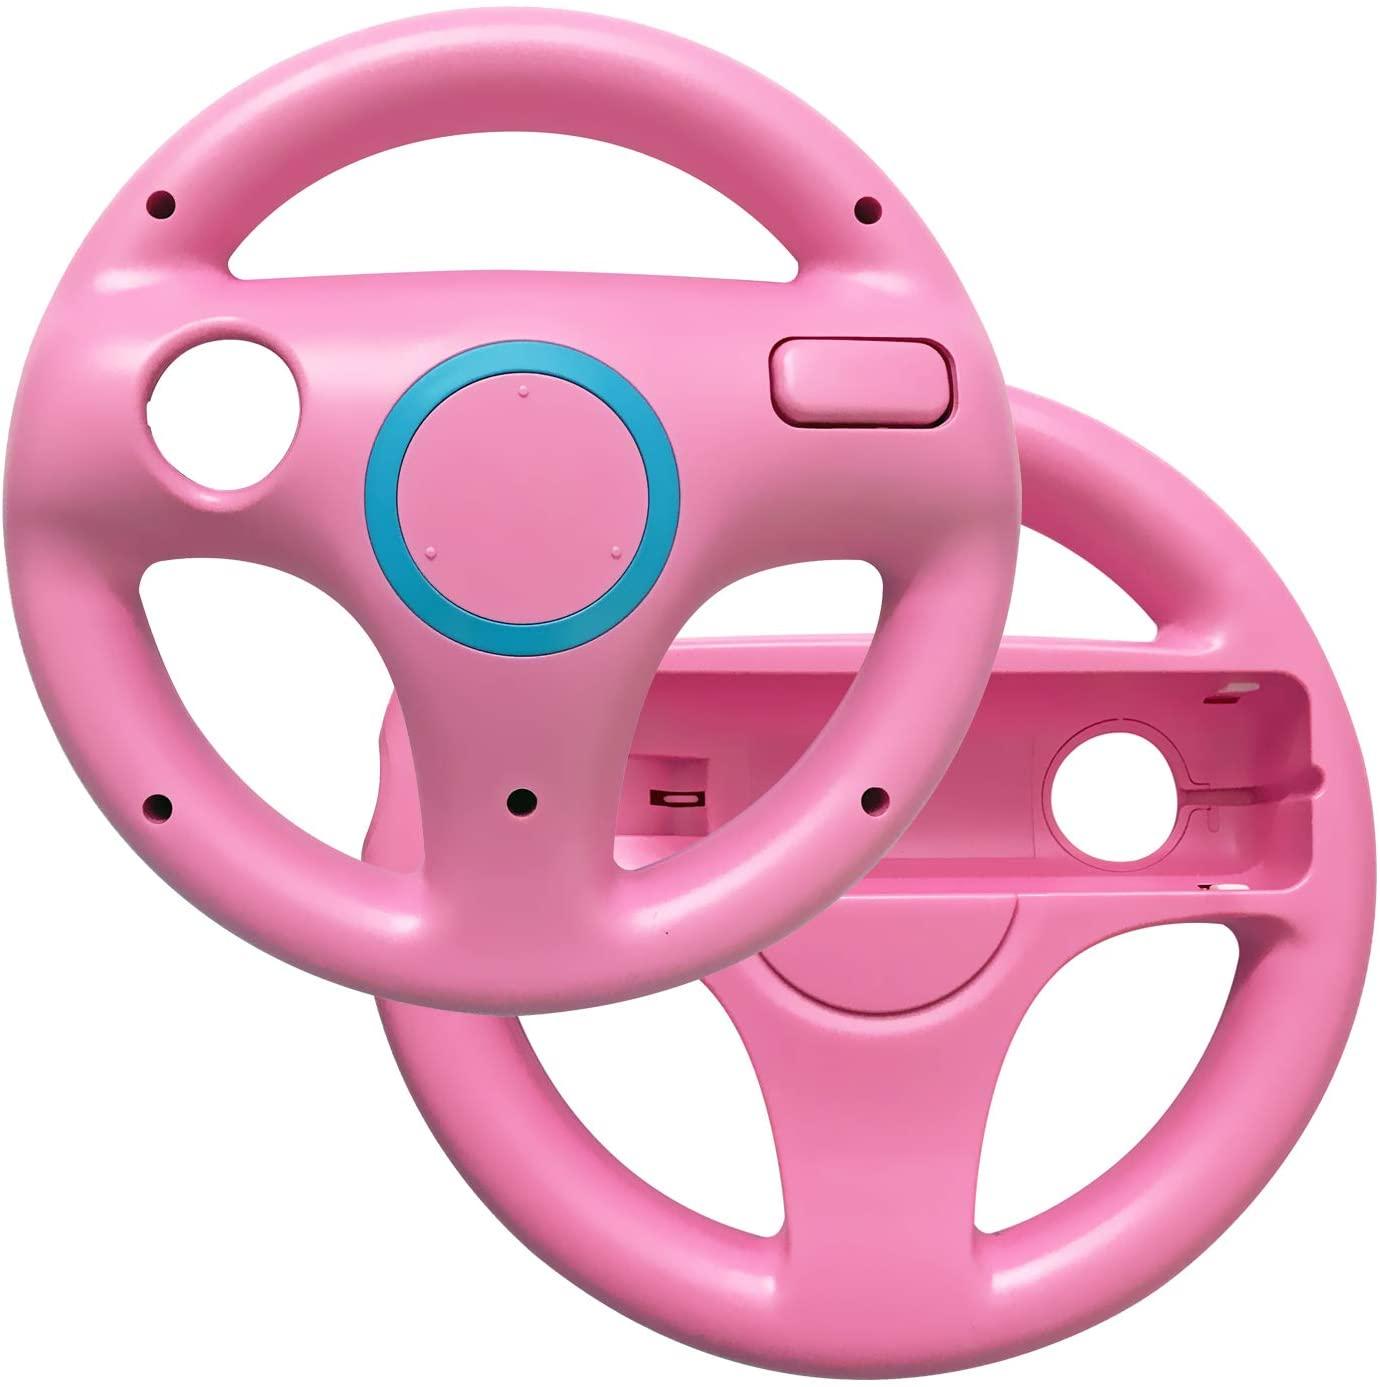 AreMe 2 Pack Mario Kart Racing Steering Wheel for Nintendo Wii (U) Remote Controller (Pink)